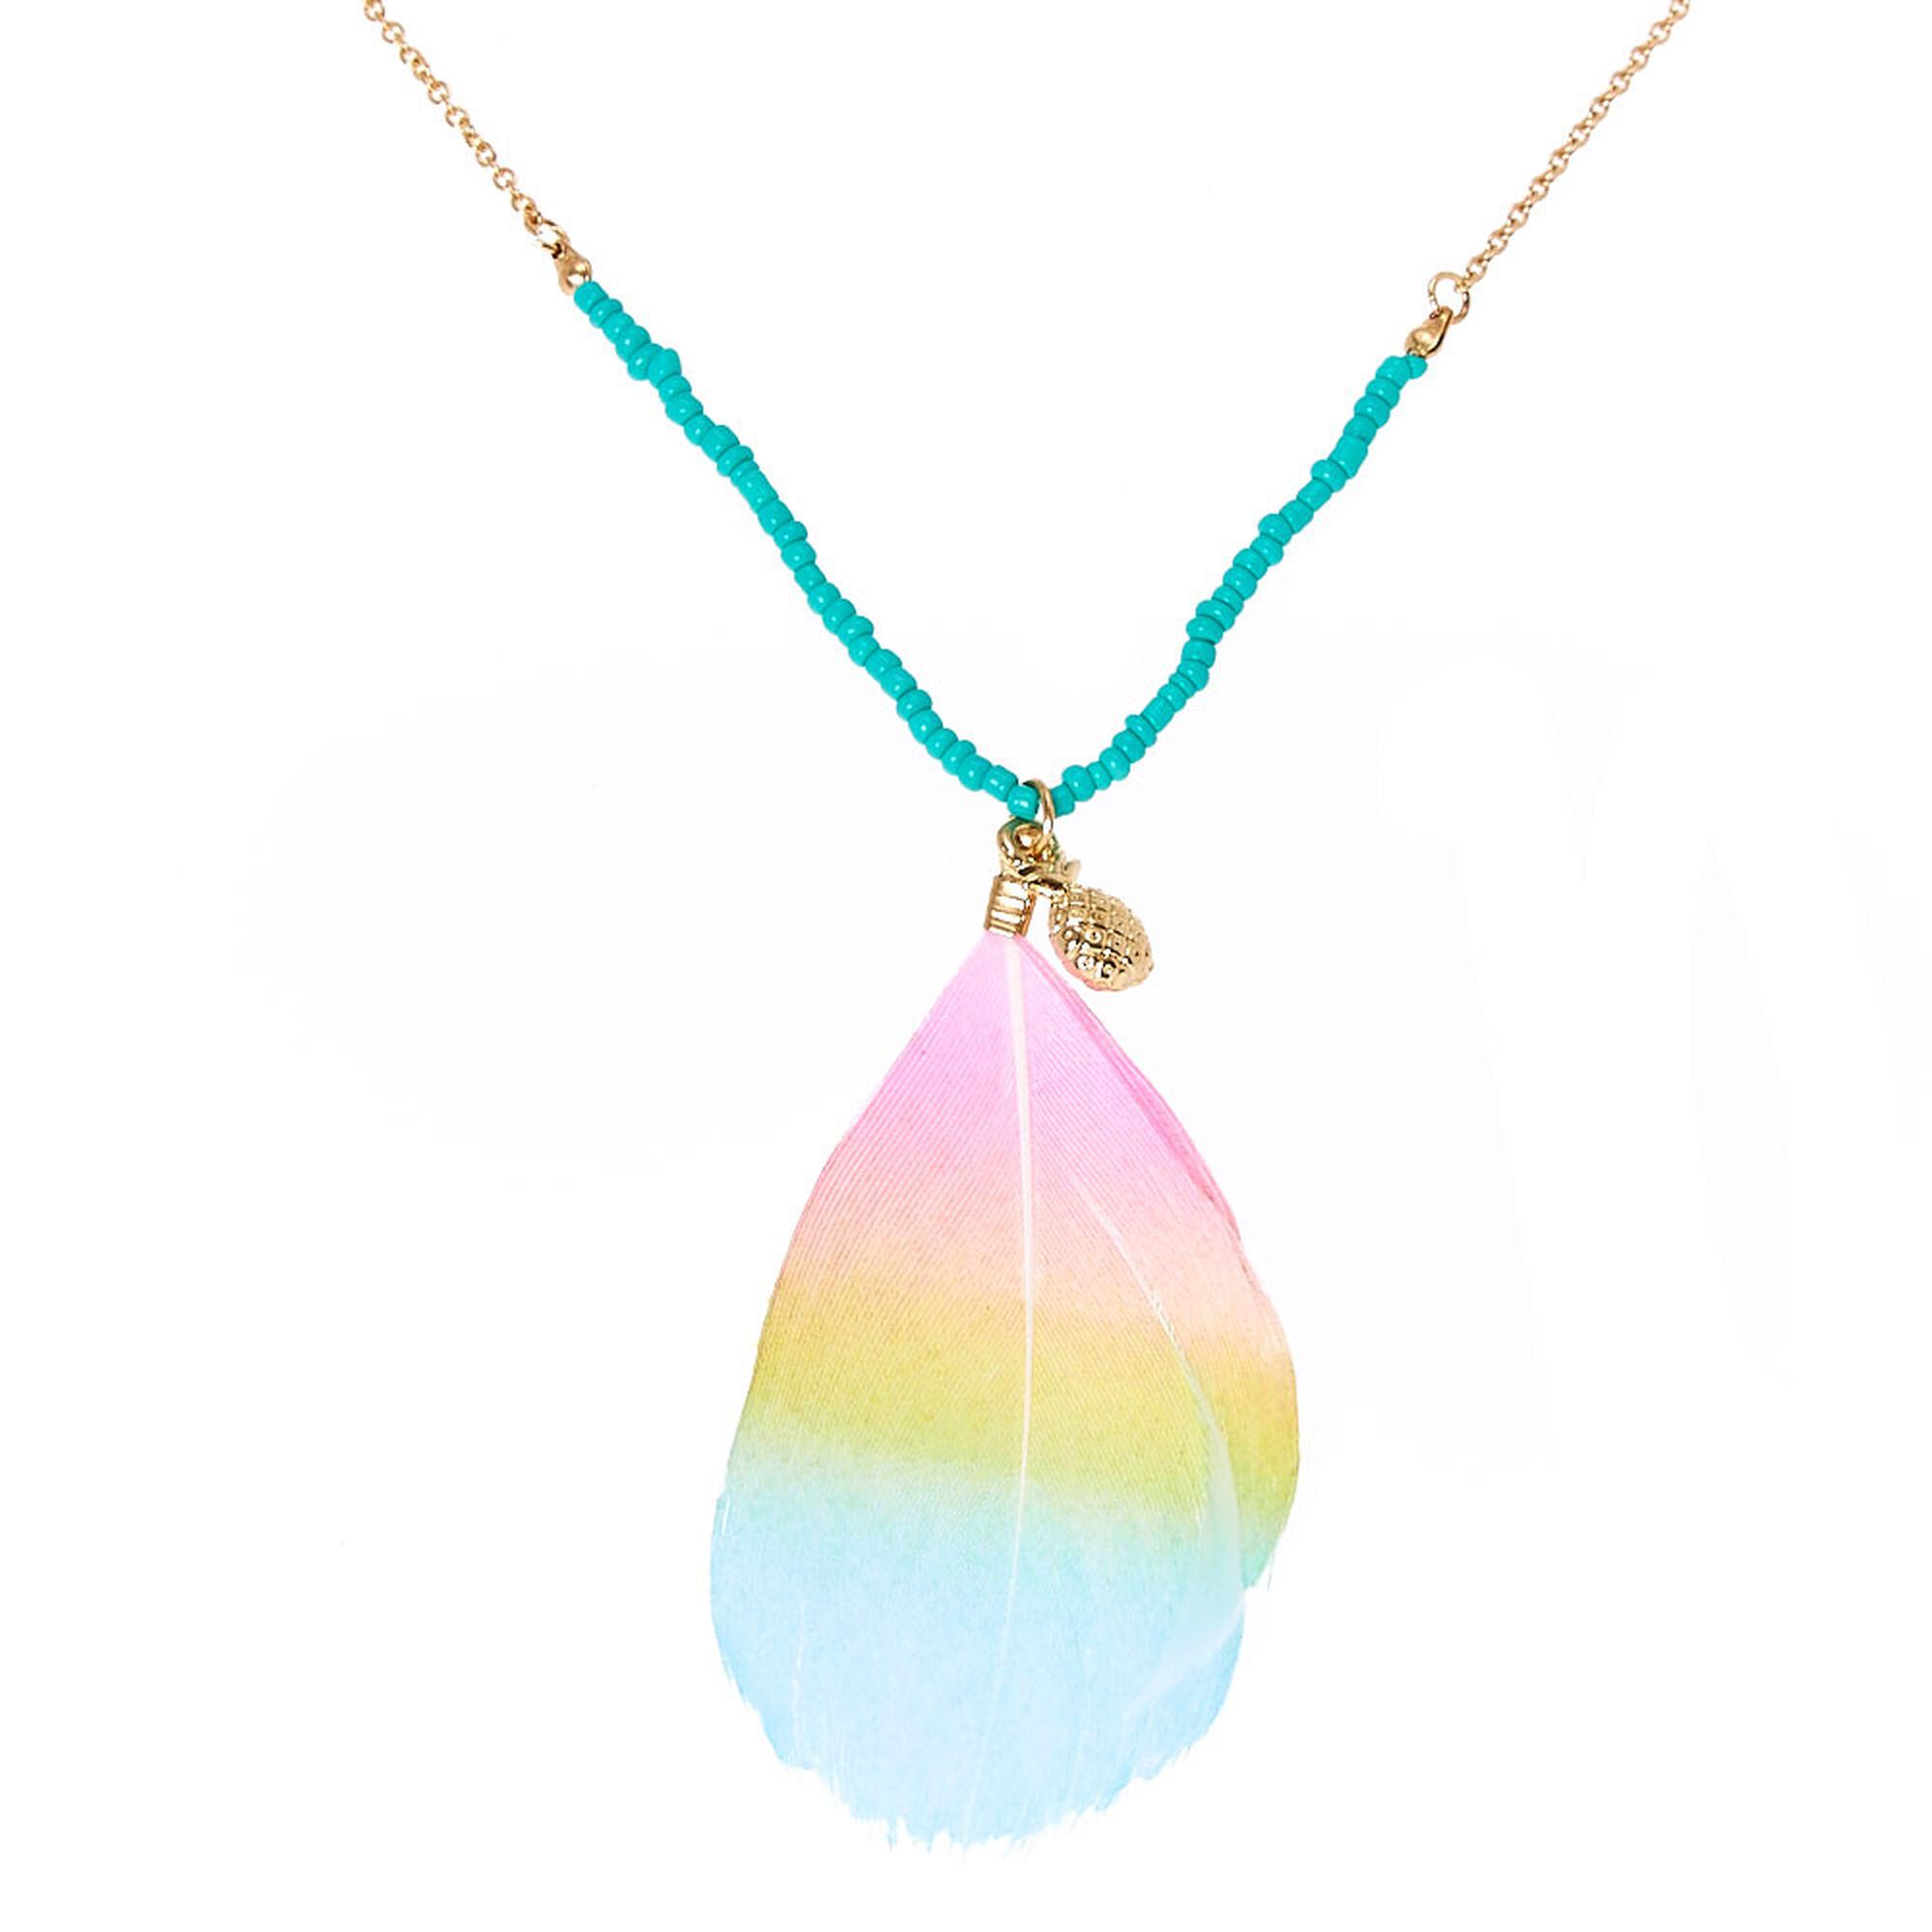 Glittery rainbow feather pendant beaded gold tone necklace claires us glittery rainbow feather pendant beaded gold tone necklace aloadofball Gallery